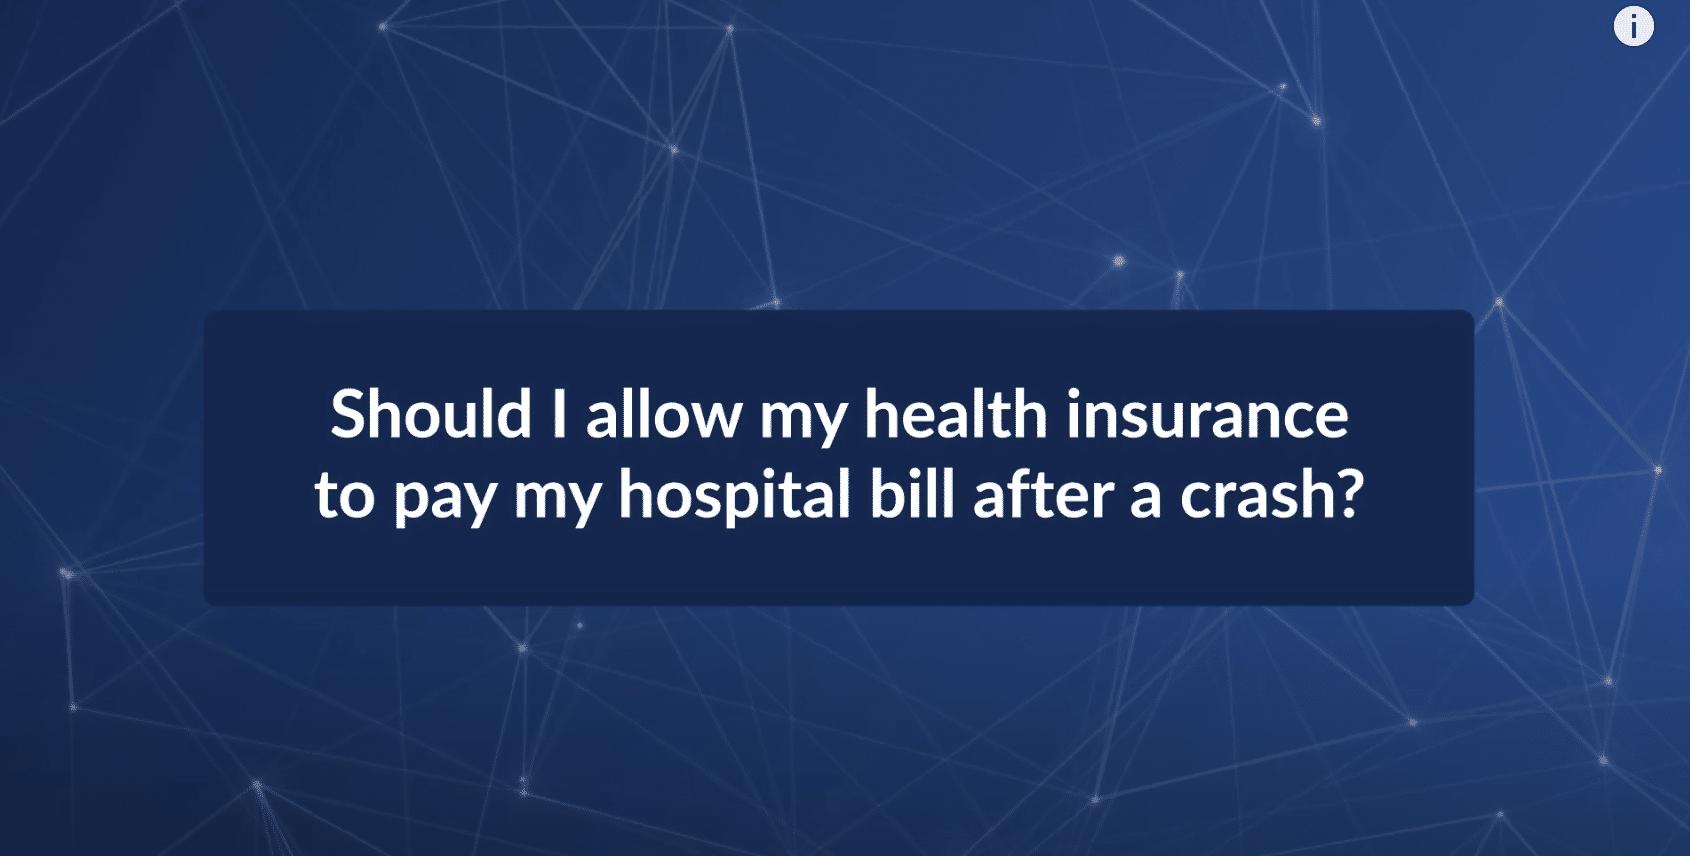 Should I Let My Health Insurance Pay My Hospital Bill After a Crash?